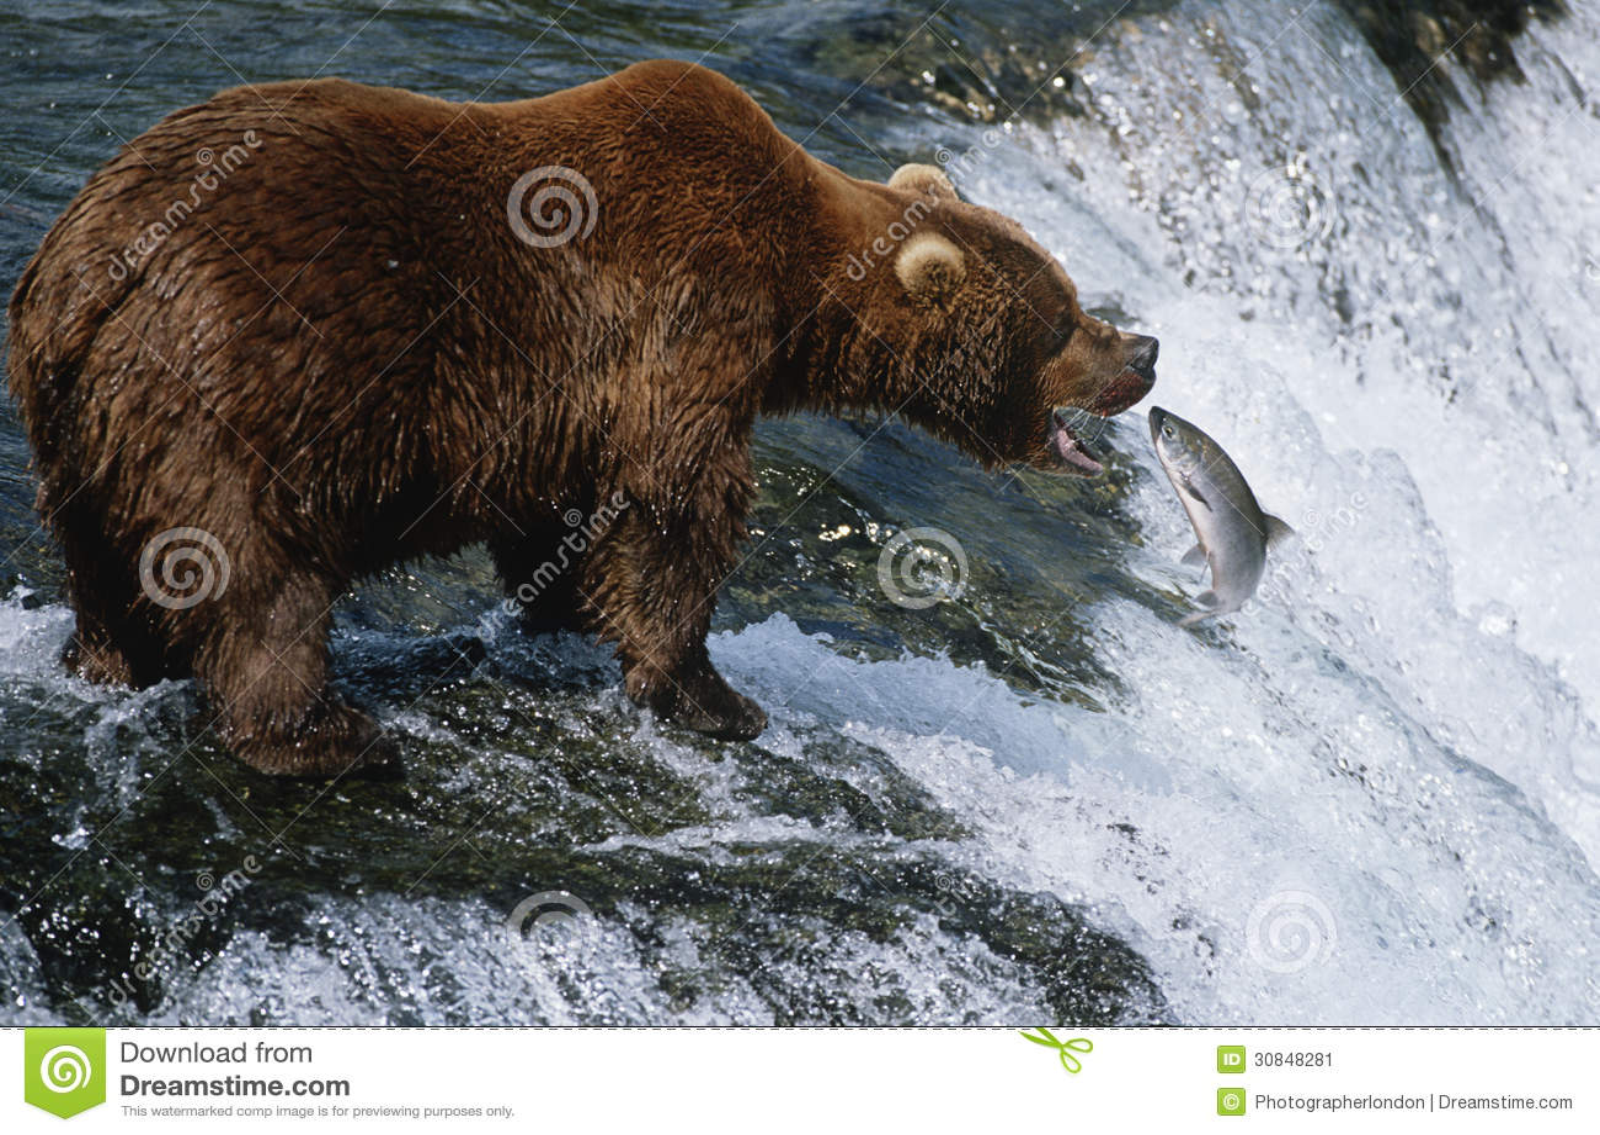 Usa alaska katmai national park brown bear catching salmon for Bear catching fish